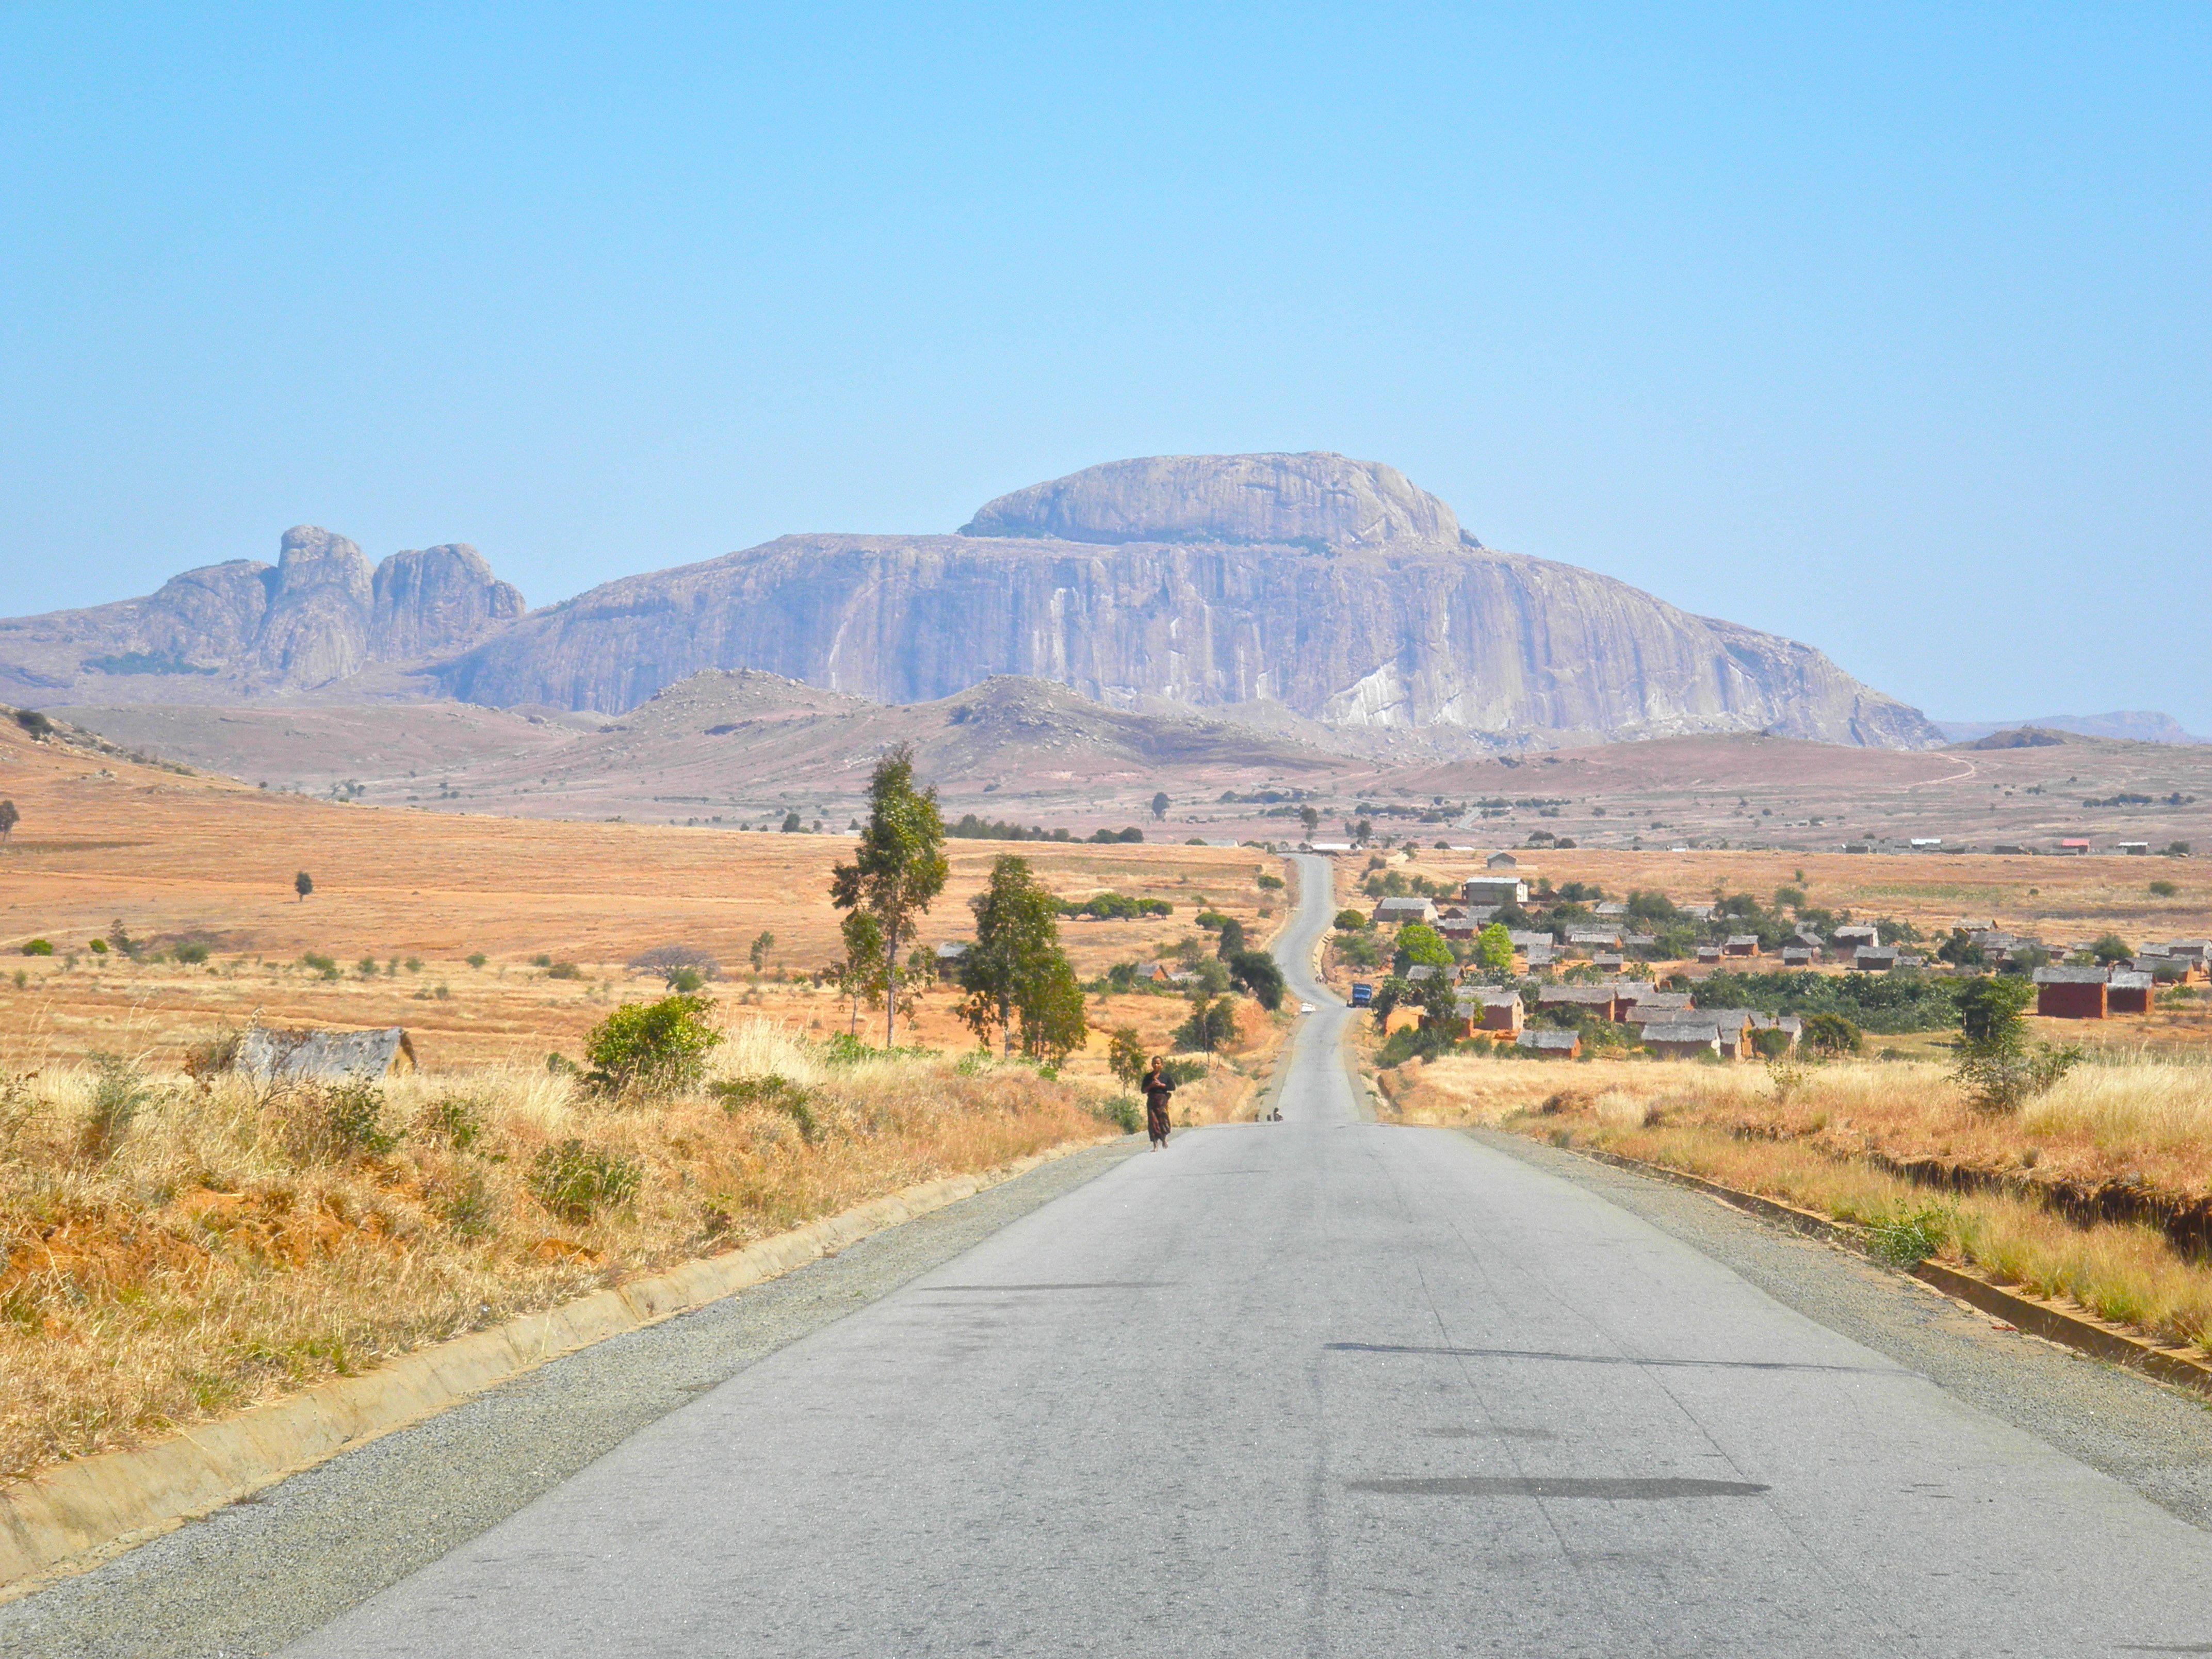 Madagascar: Carretera nacional RN7